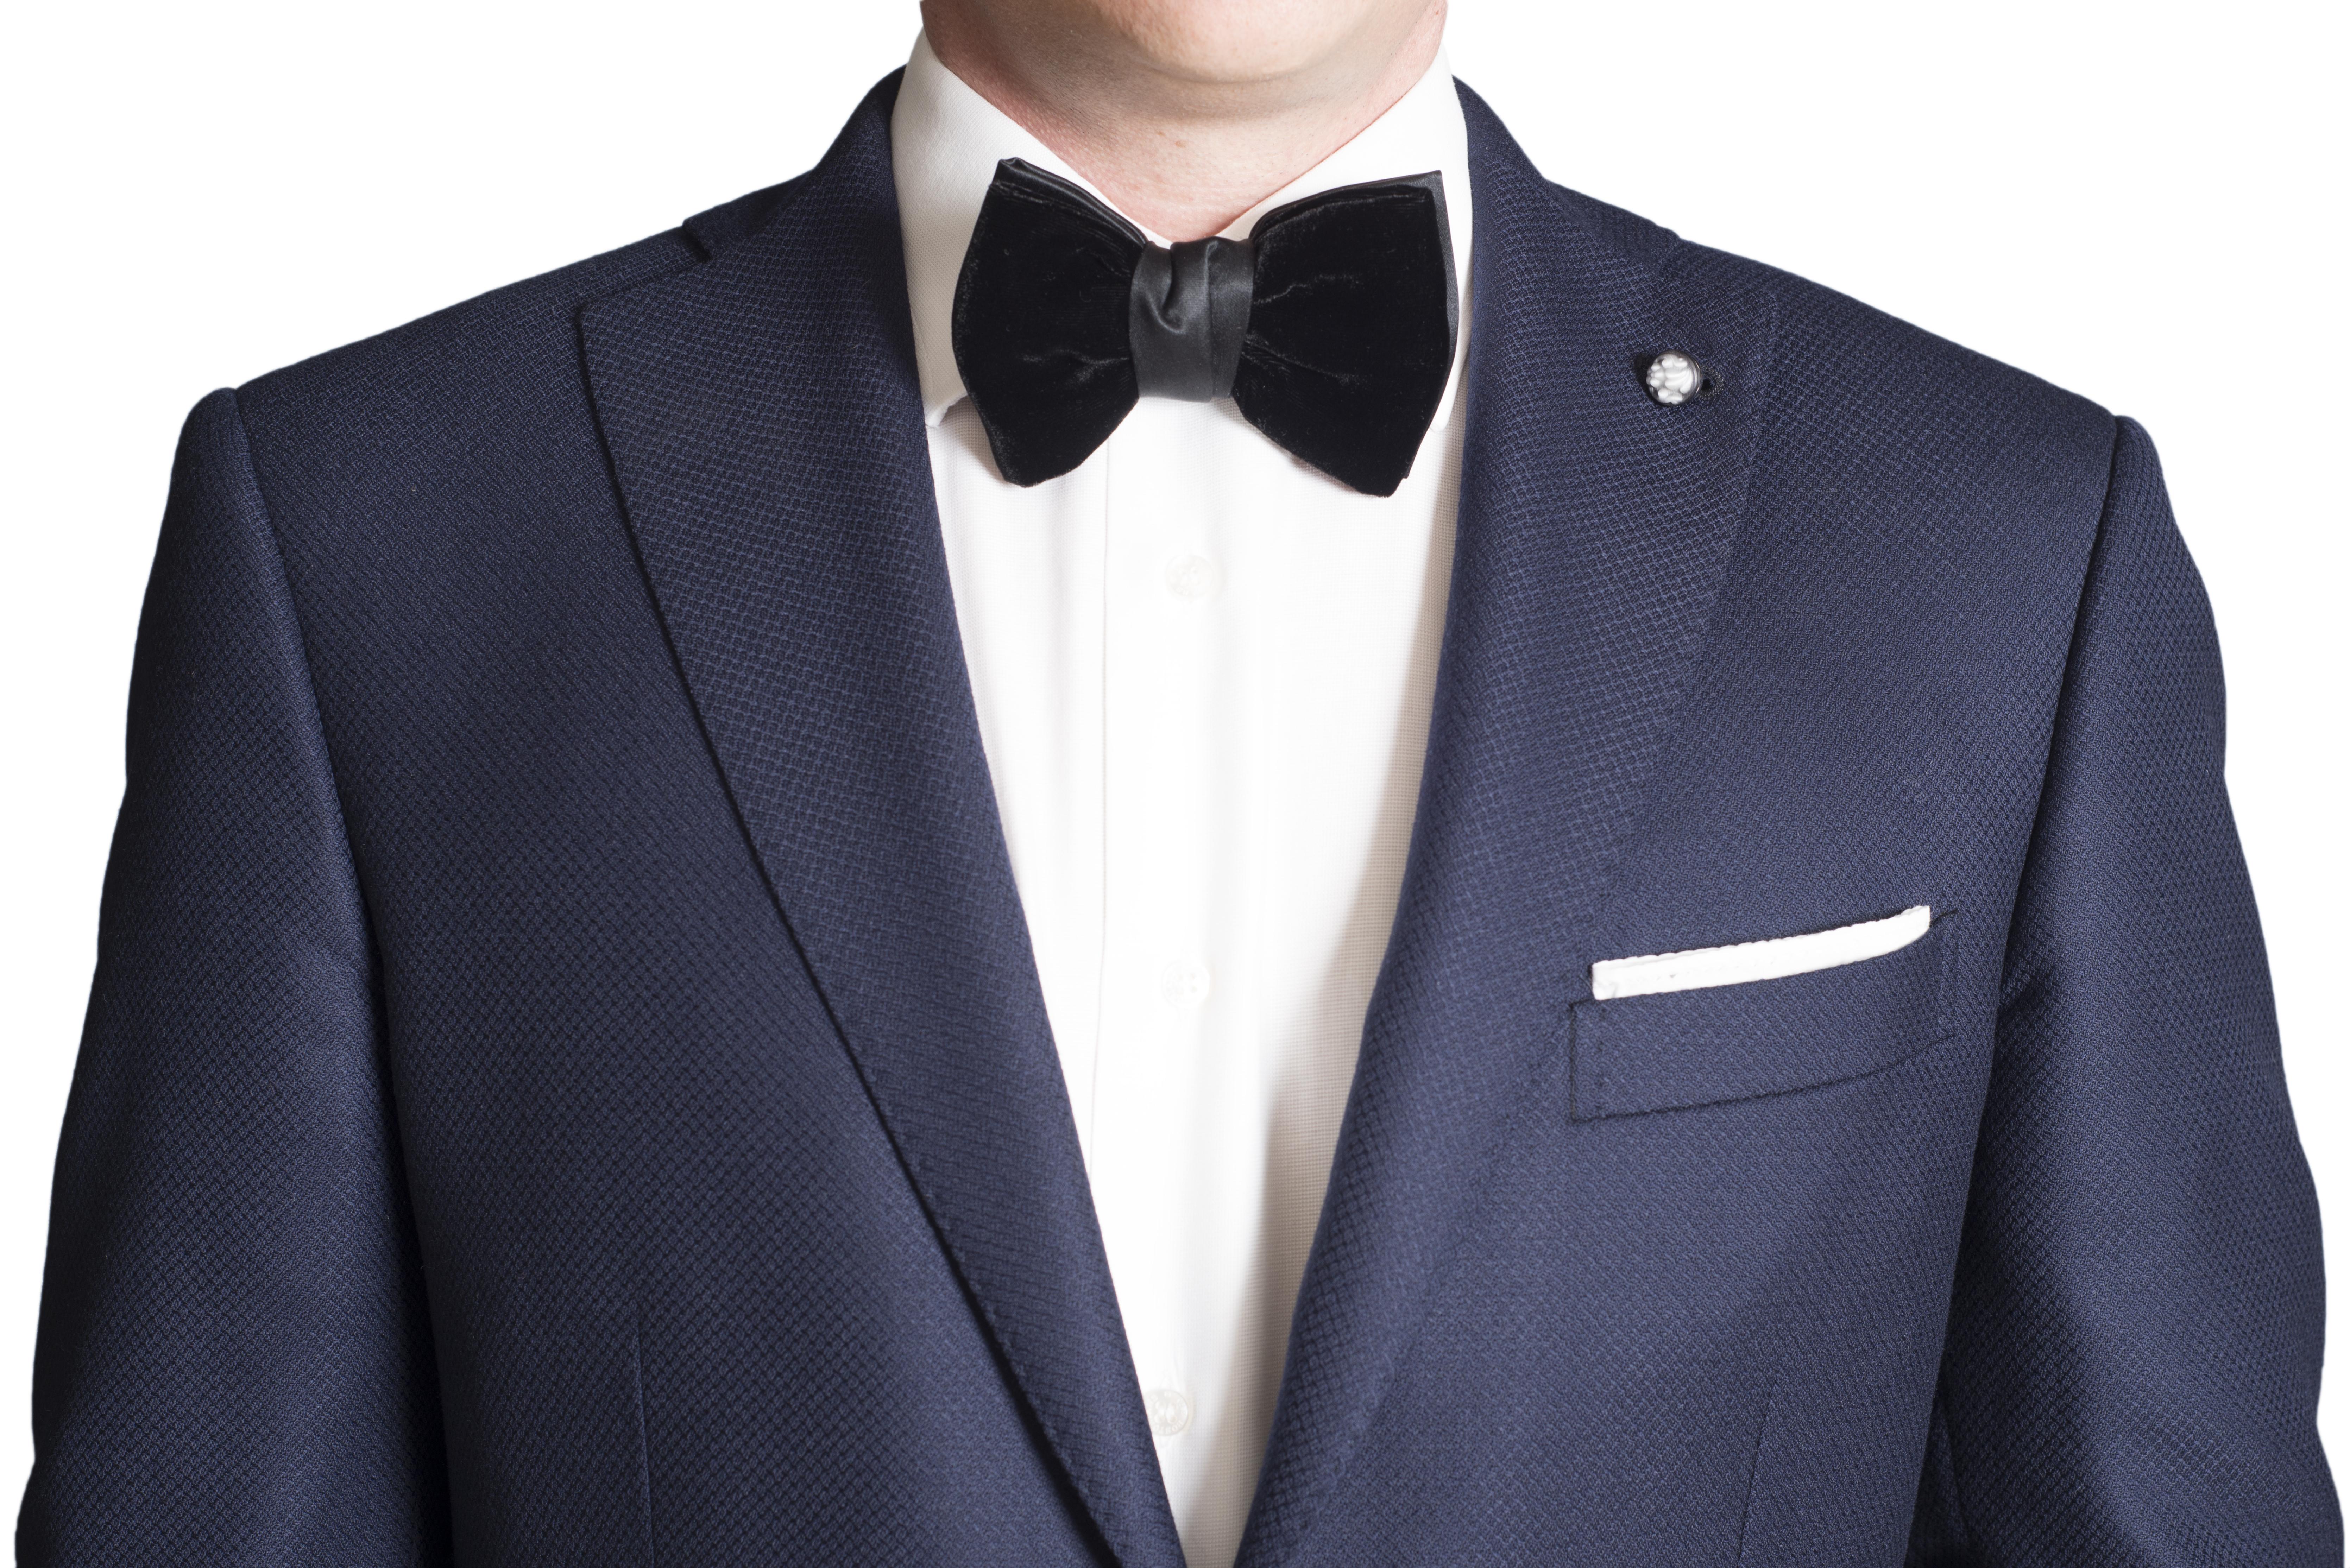 kydos styleforum holiday office party black velvet bow tie